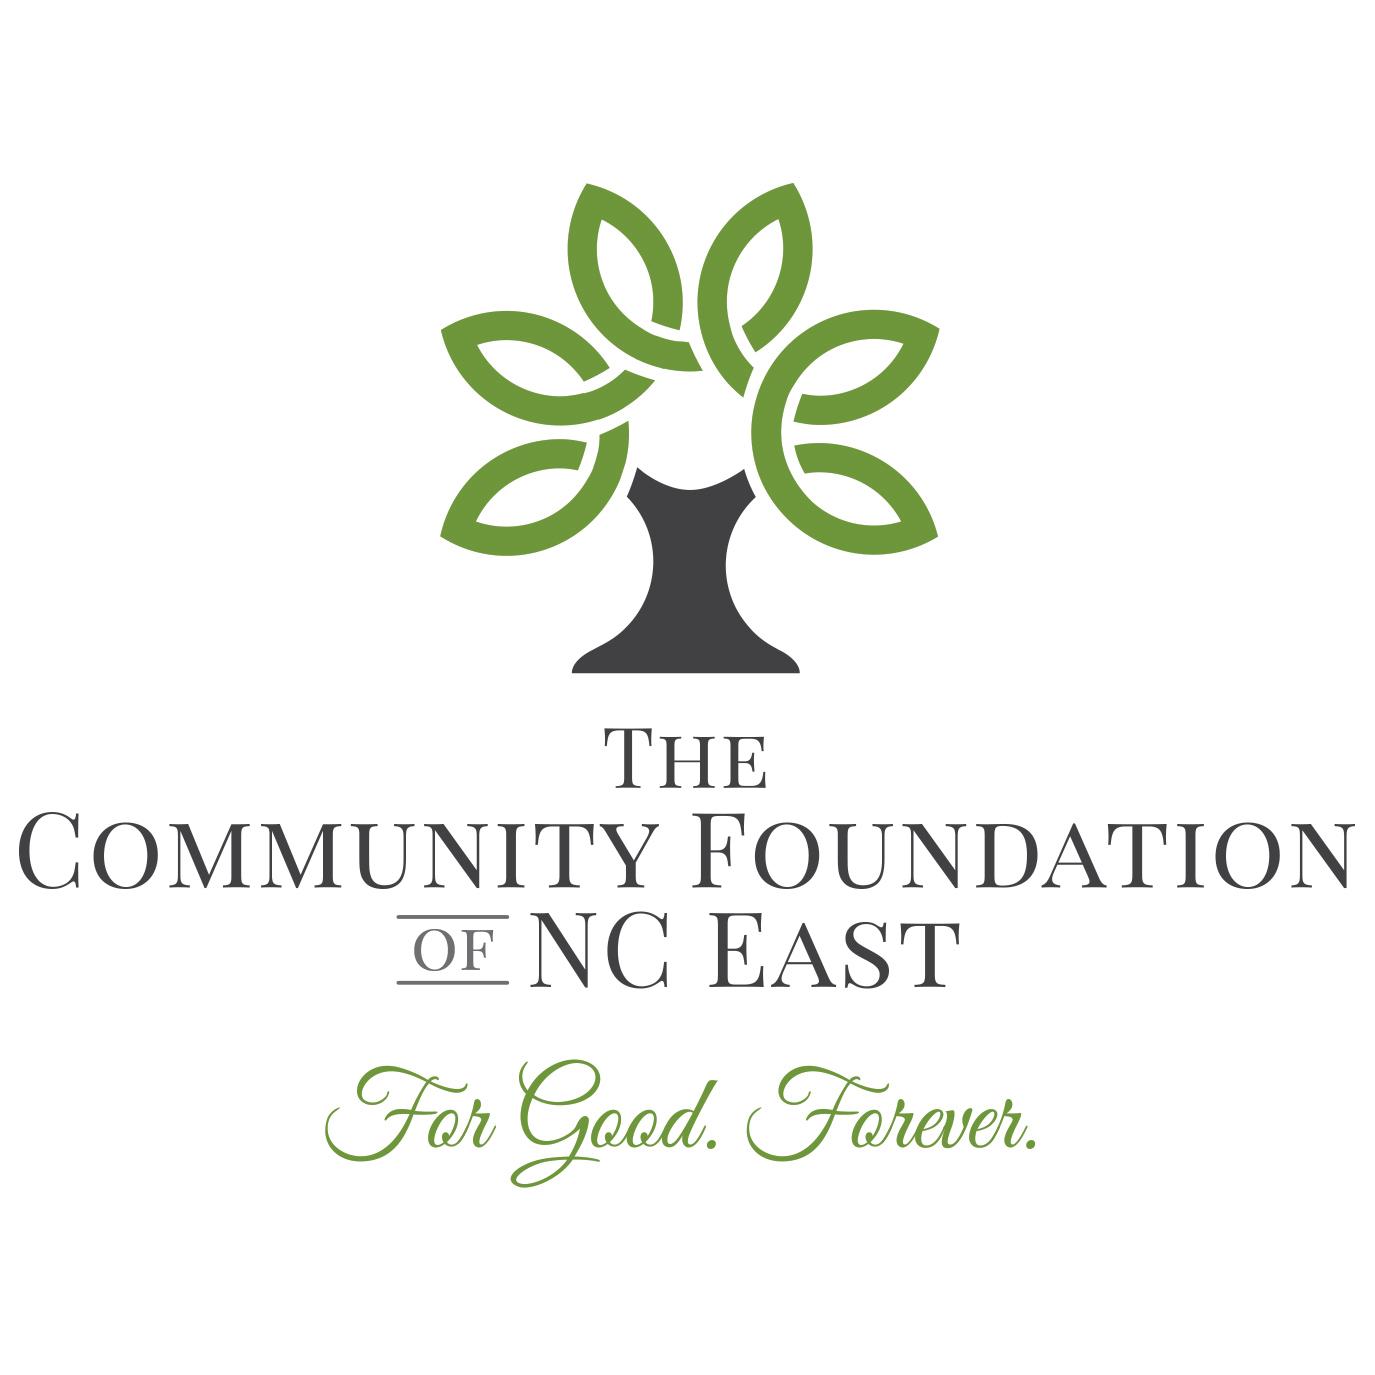 Community Foundation of NC East